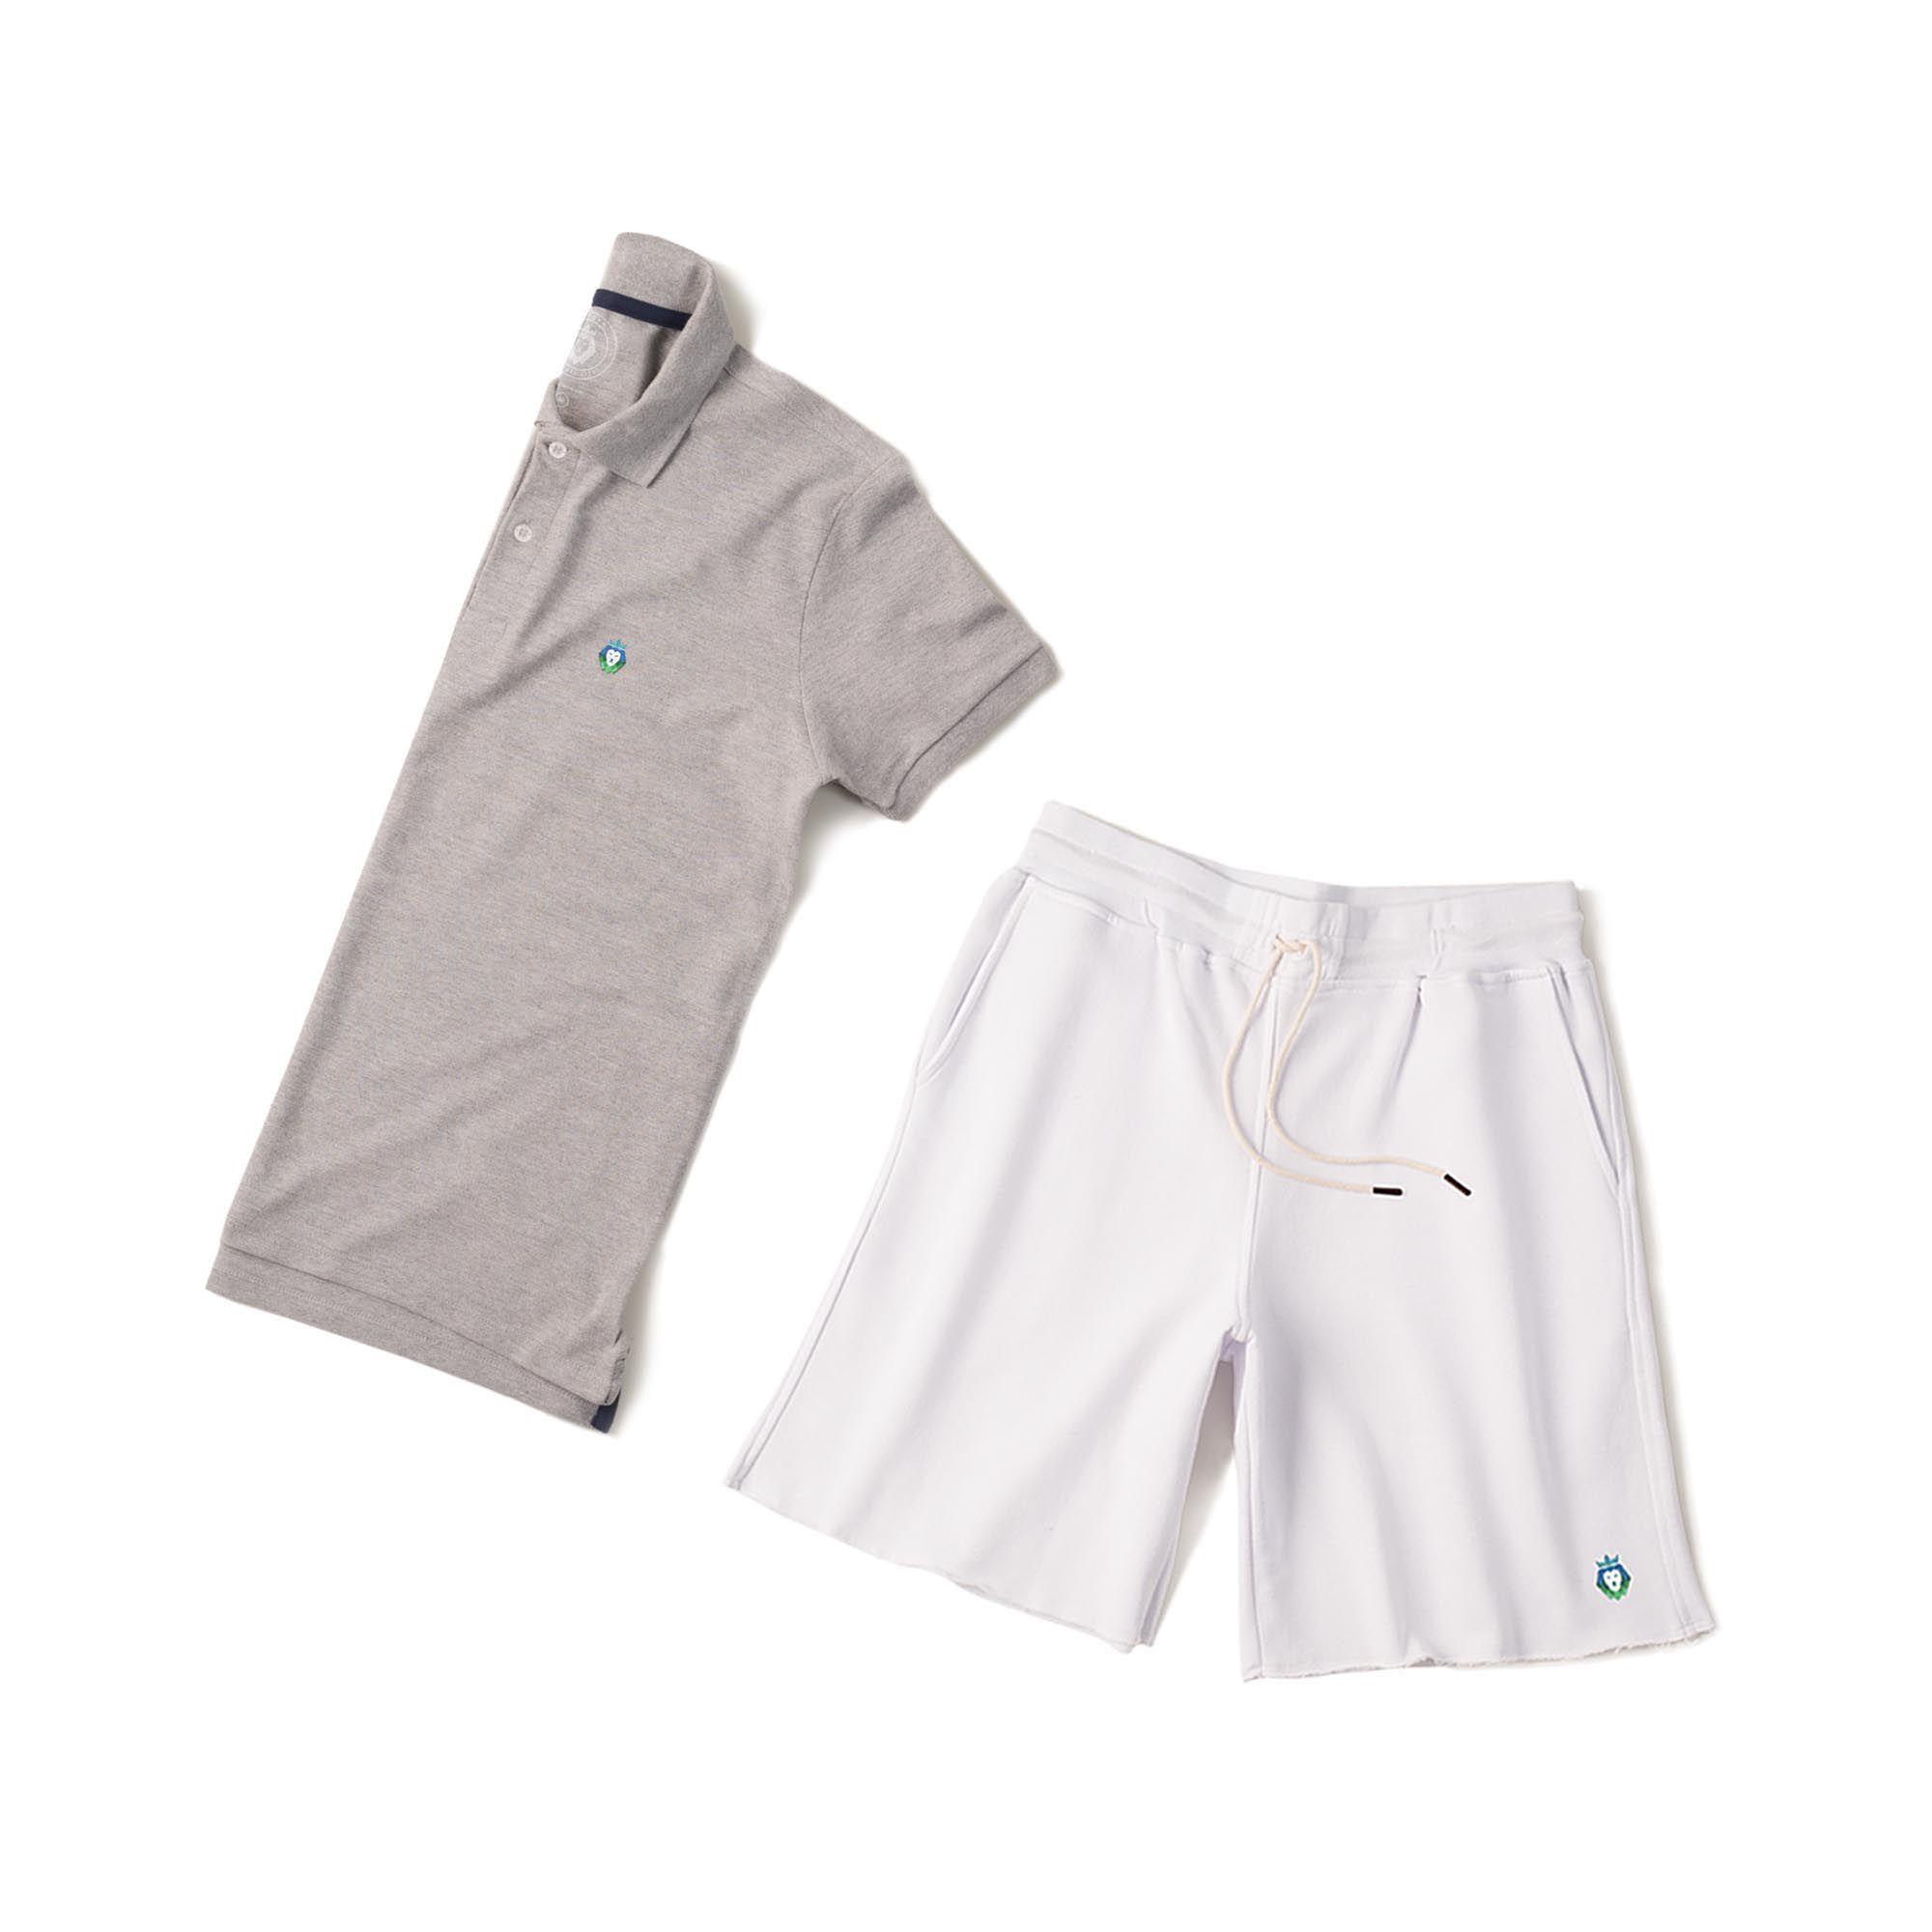 0419a5218 ... Kit 1 Bermuda Basic Branca + 1 Camisa Polo Style Mescla Zaiden Masculina